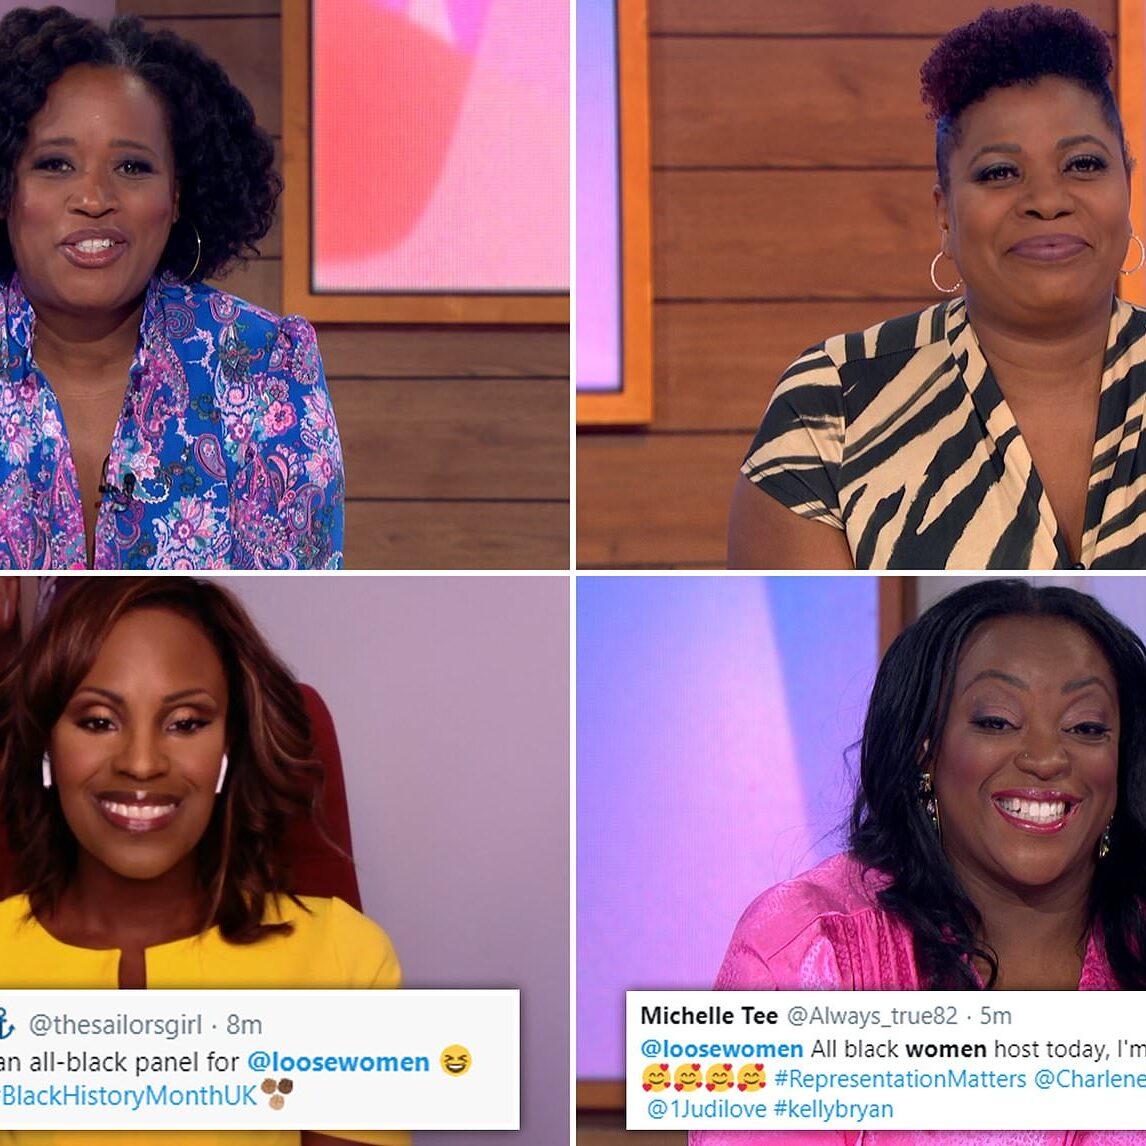 MI Loose Women's First All Black Panel